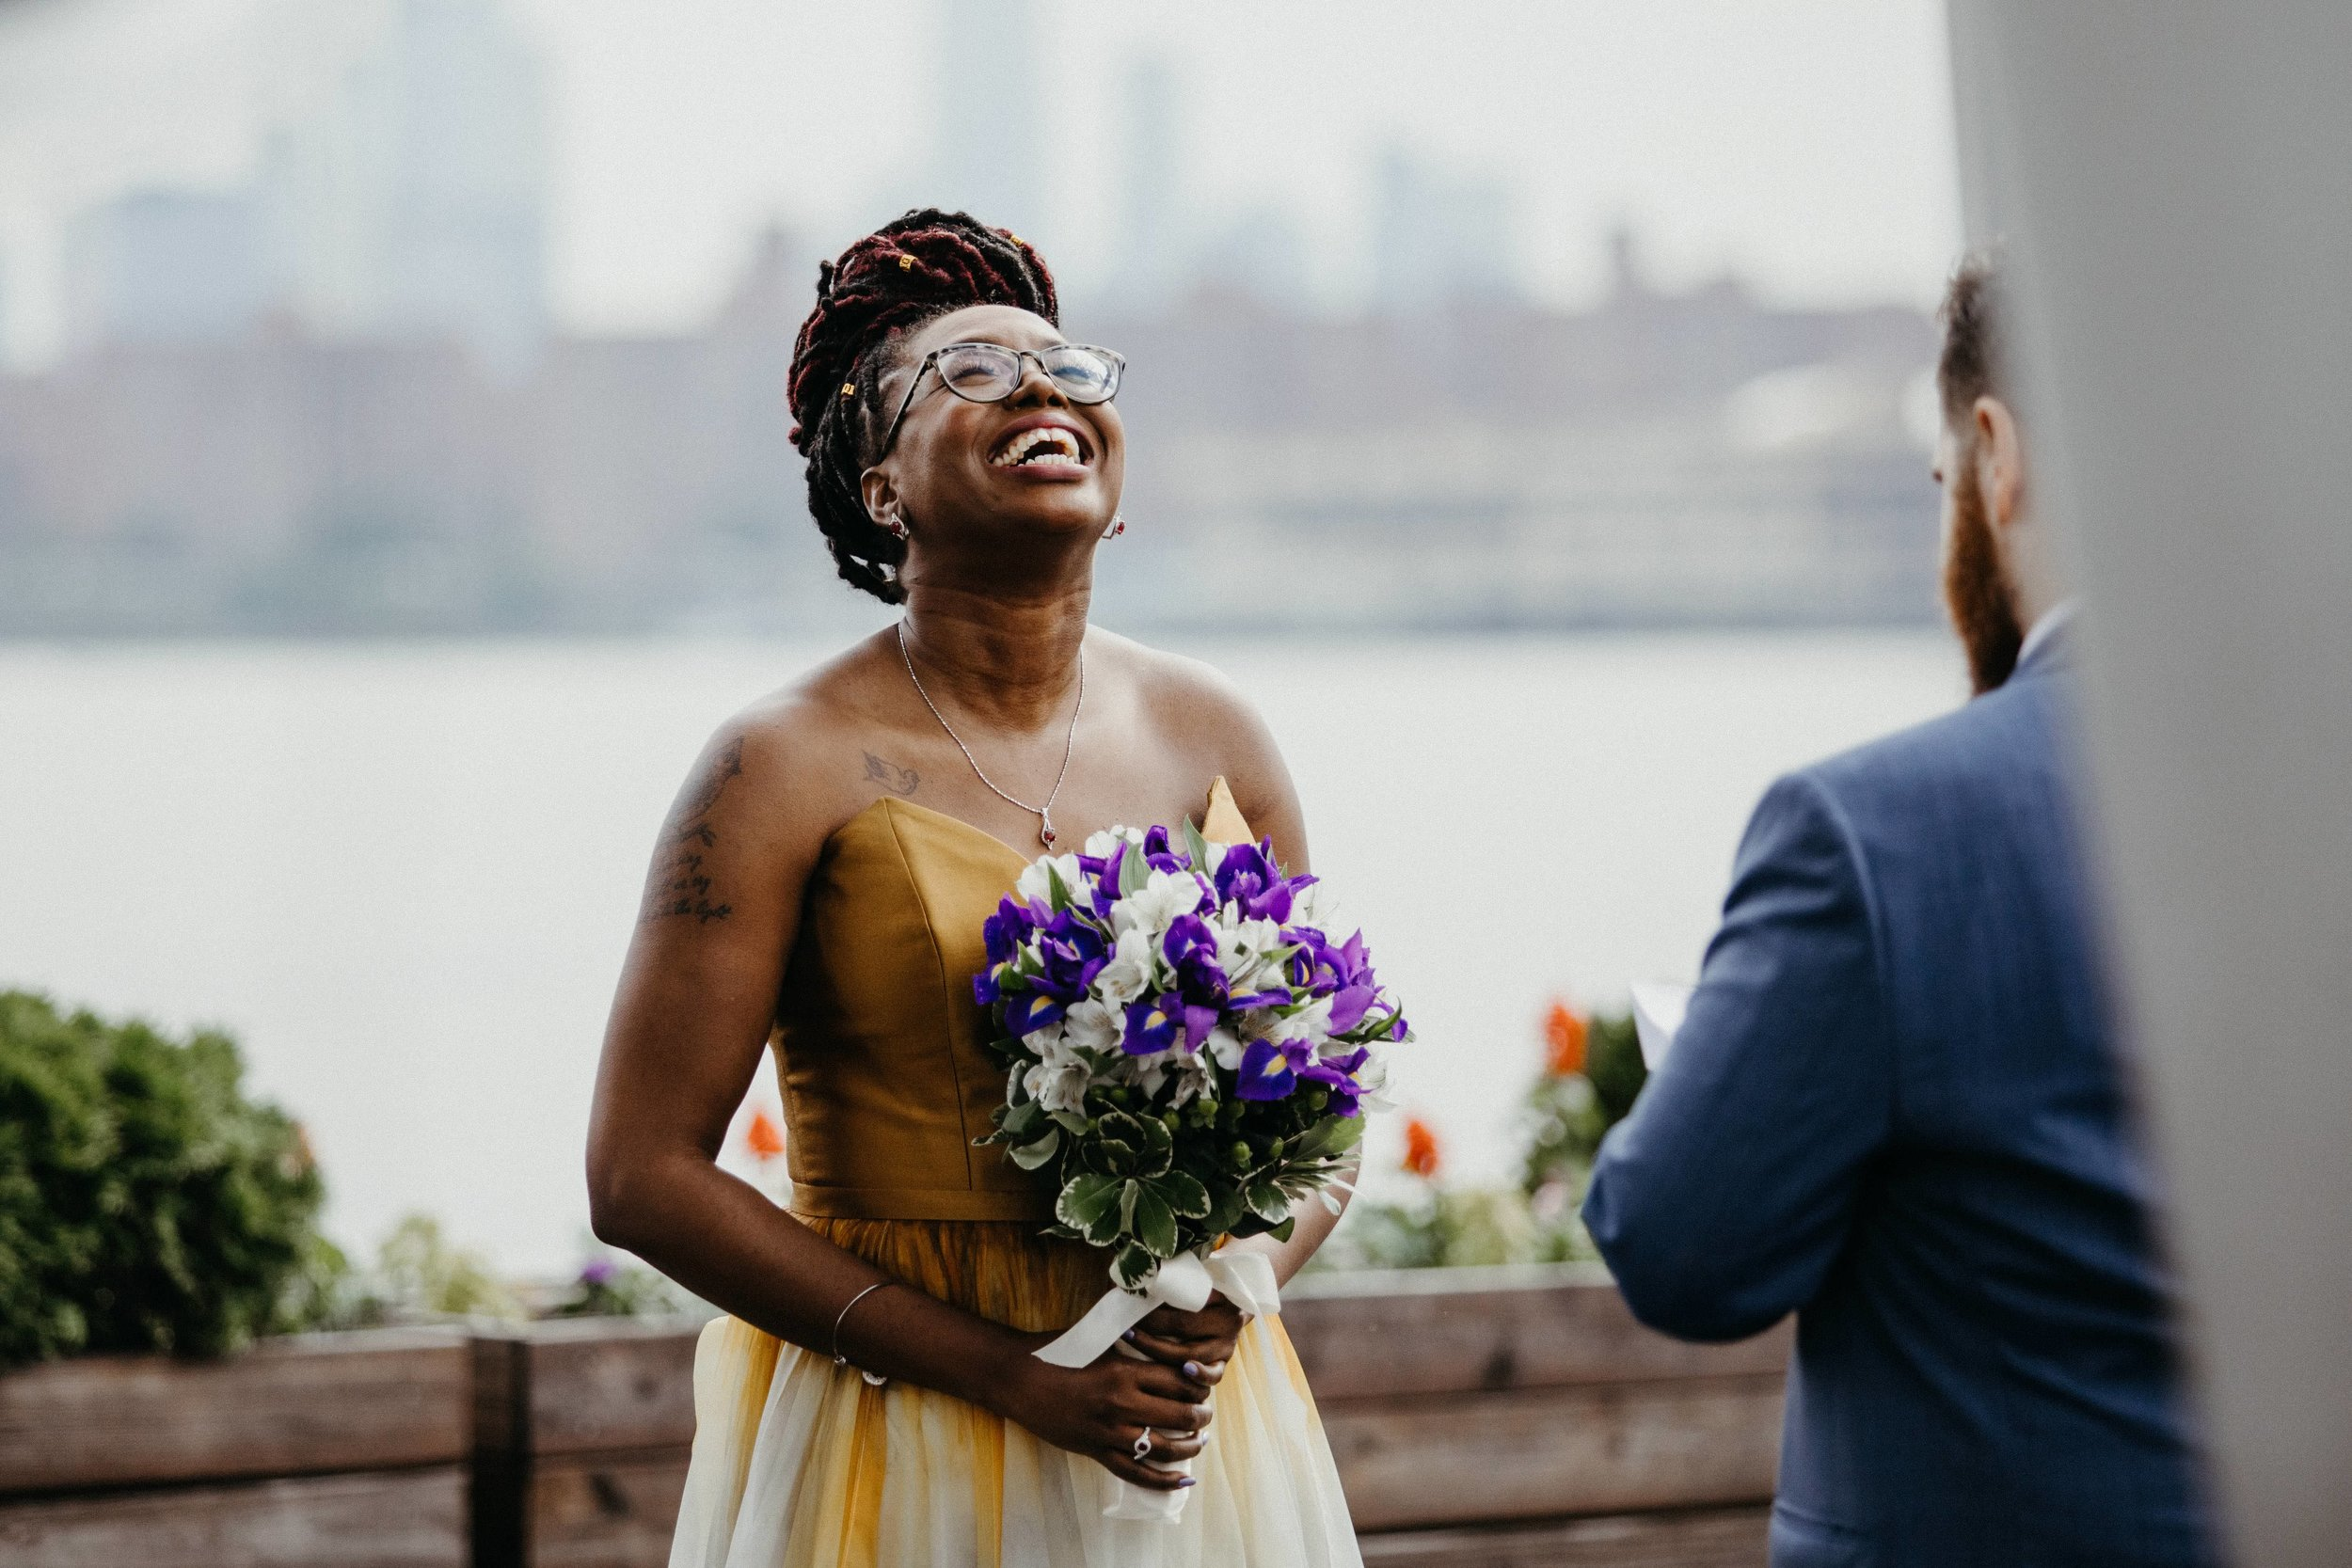 Sevlynn-Photography-Wedding-LIC-Landing-Maiella-NYC-41.jpg